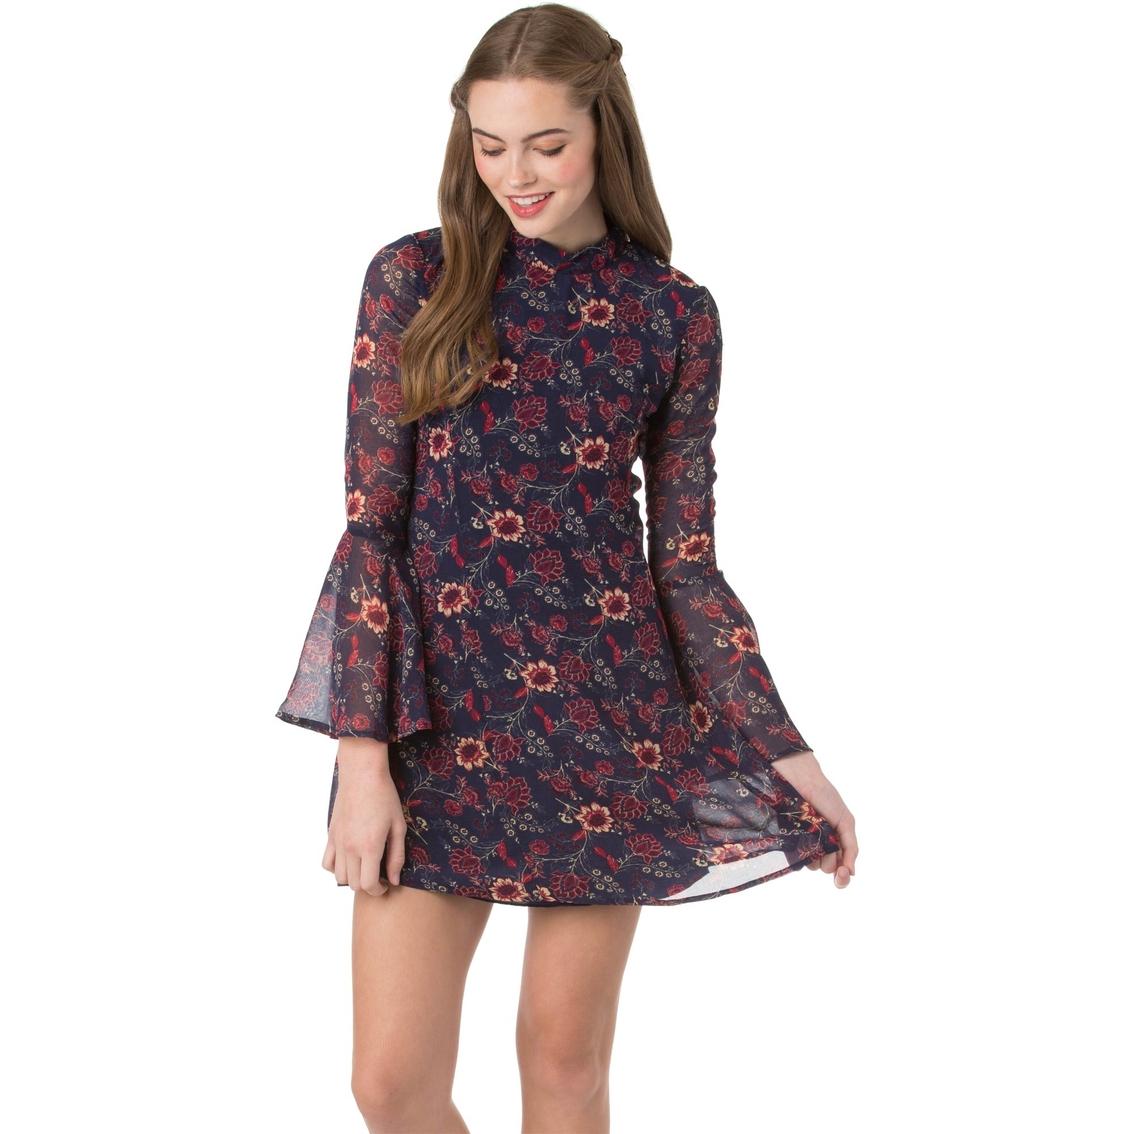 65a61d762 Speechless Juniors Lace Tulle Skater Dress   Dresses   Apparel ...